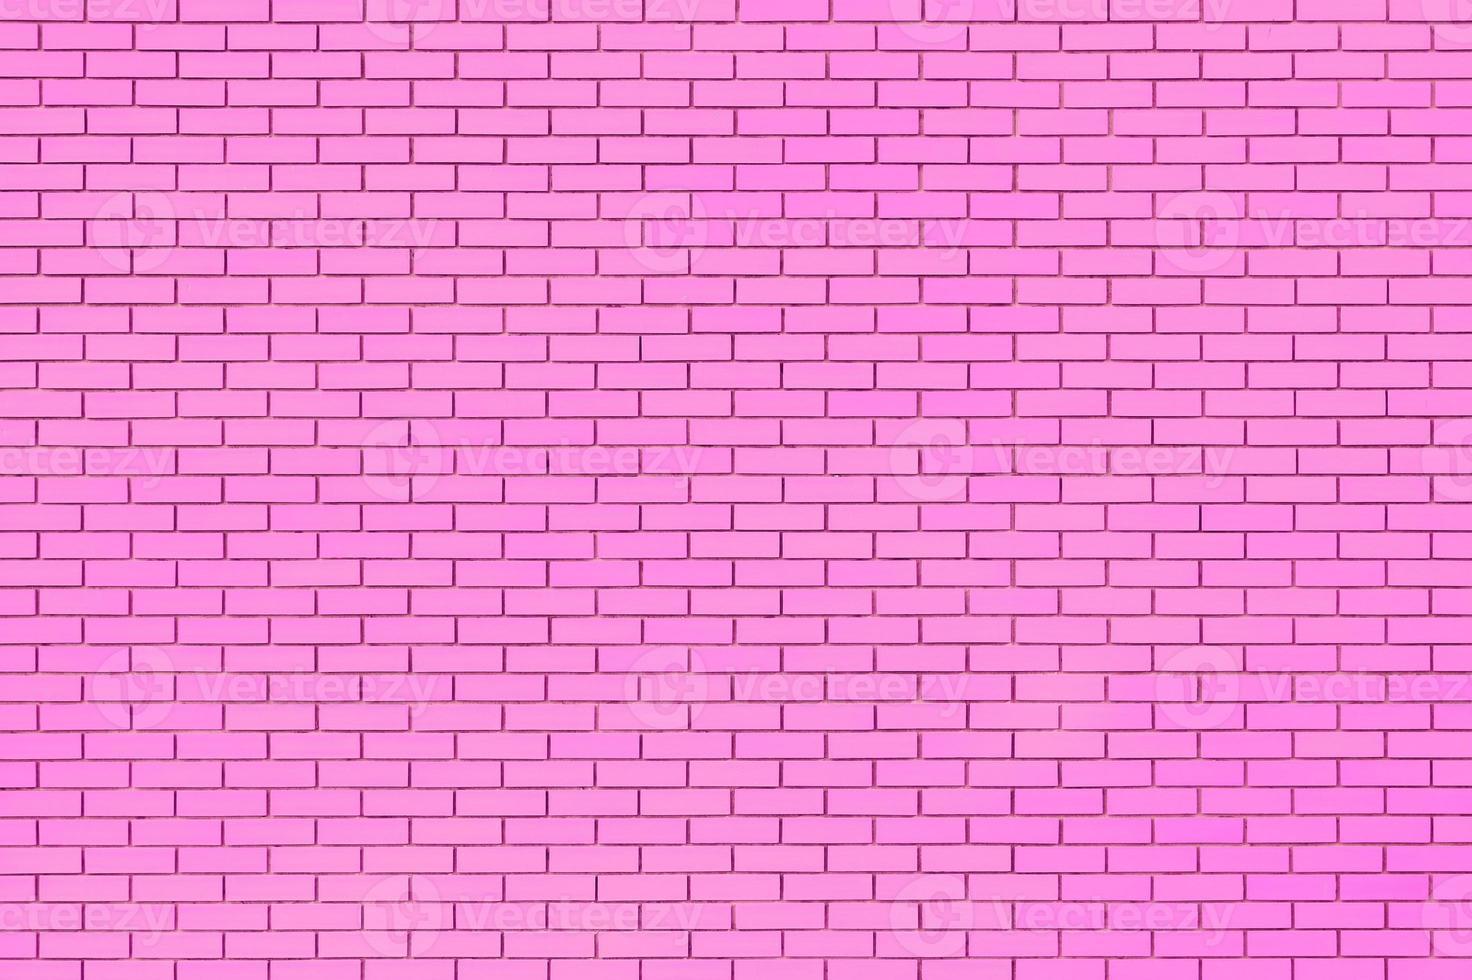 textura de couro de concreto rosa para o fundo foto